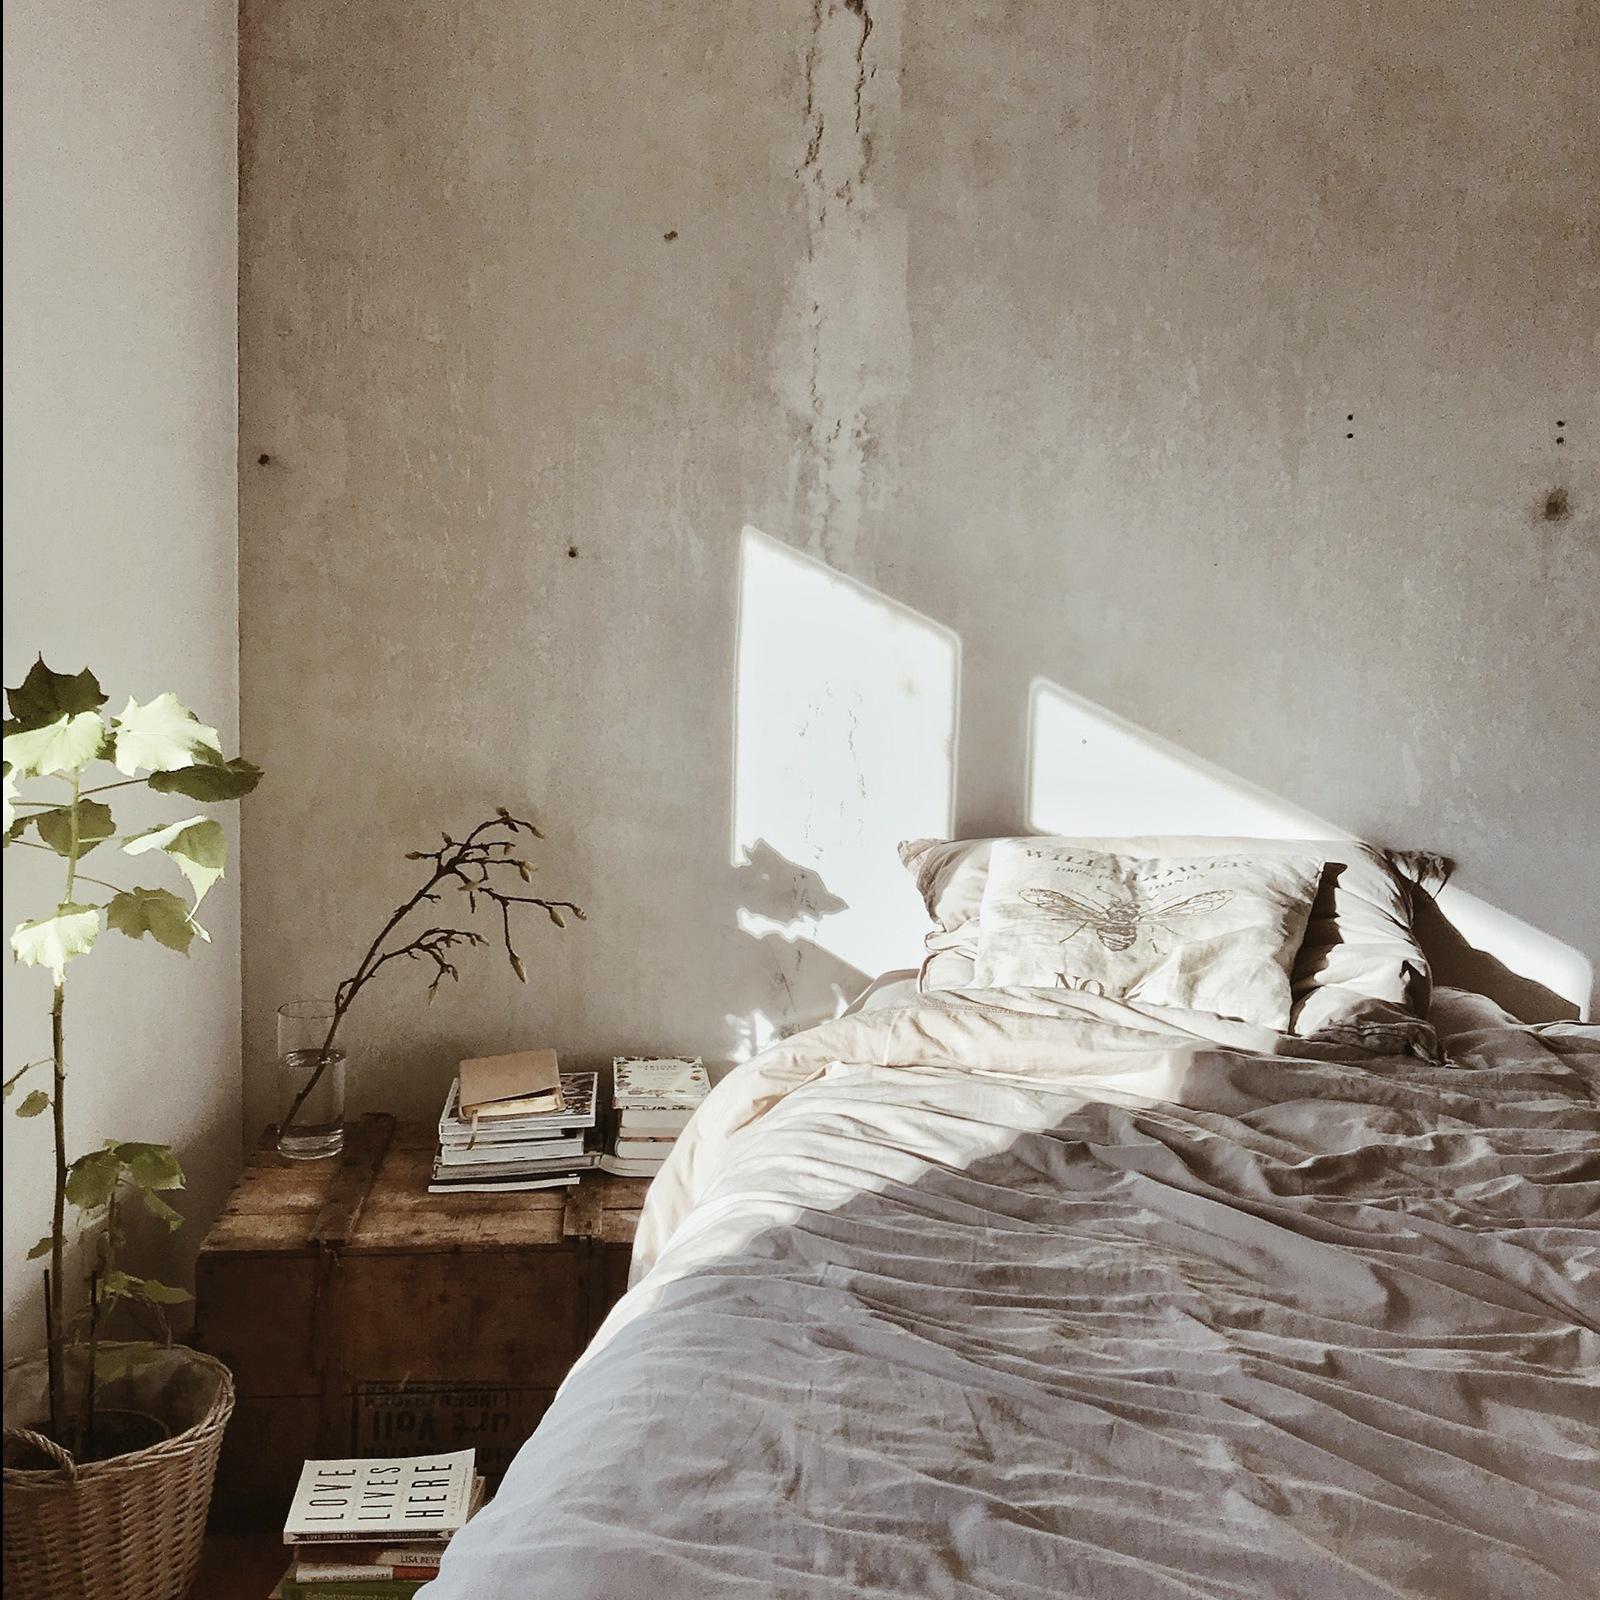 How to Apply Japanese Wabi-Sabi in Interior Design